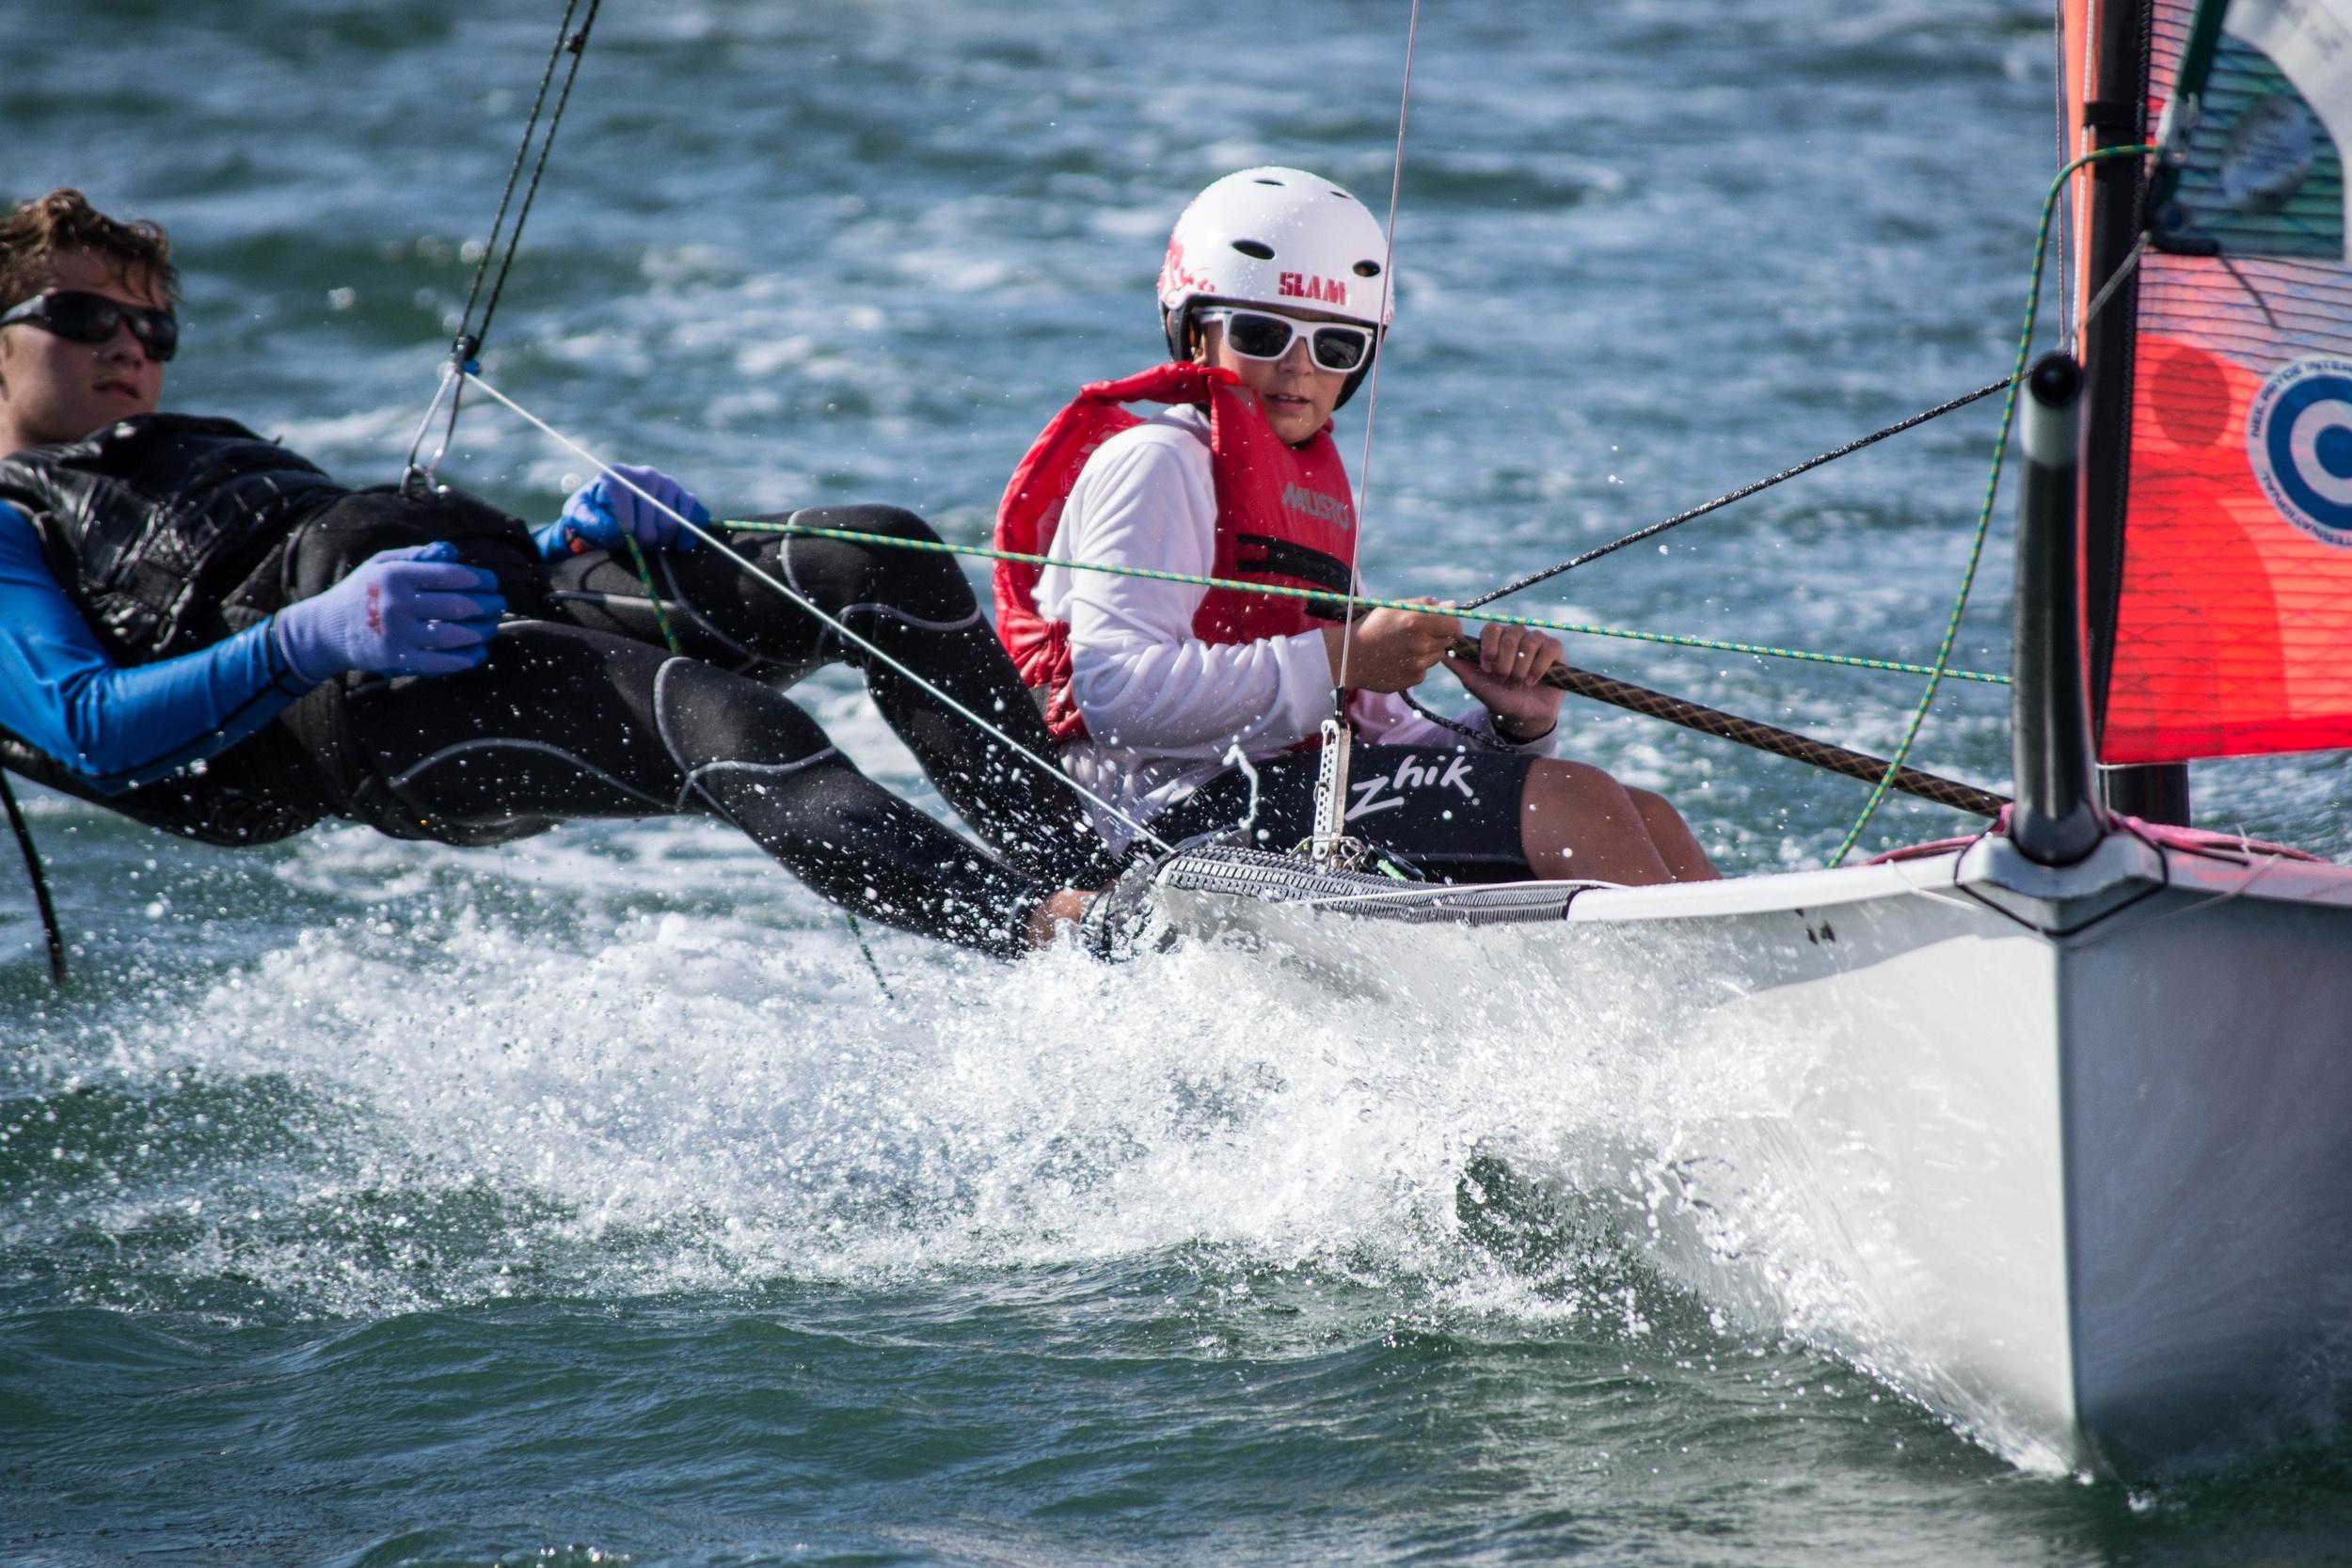 Peter Joslin and Jack Joslin sailing downwind in the 29er skiff